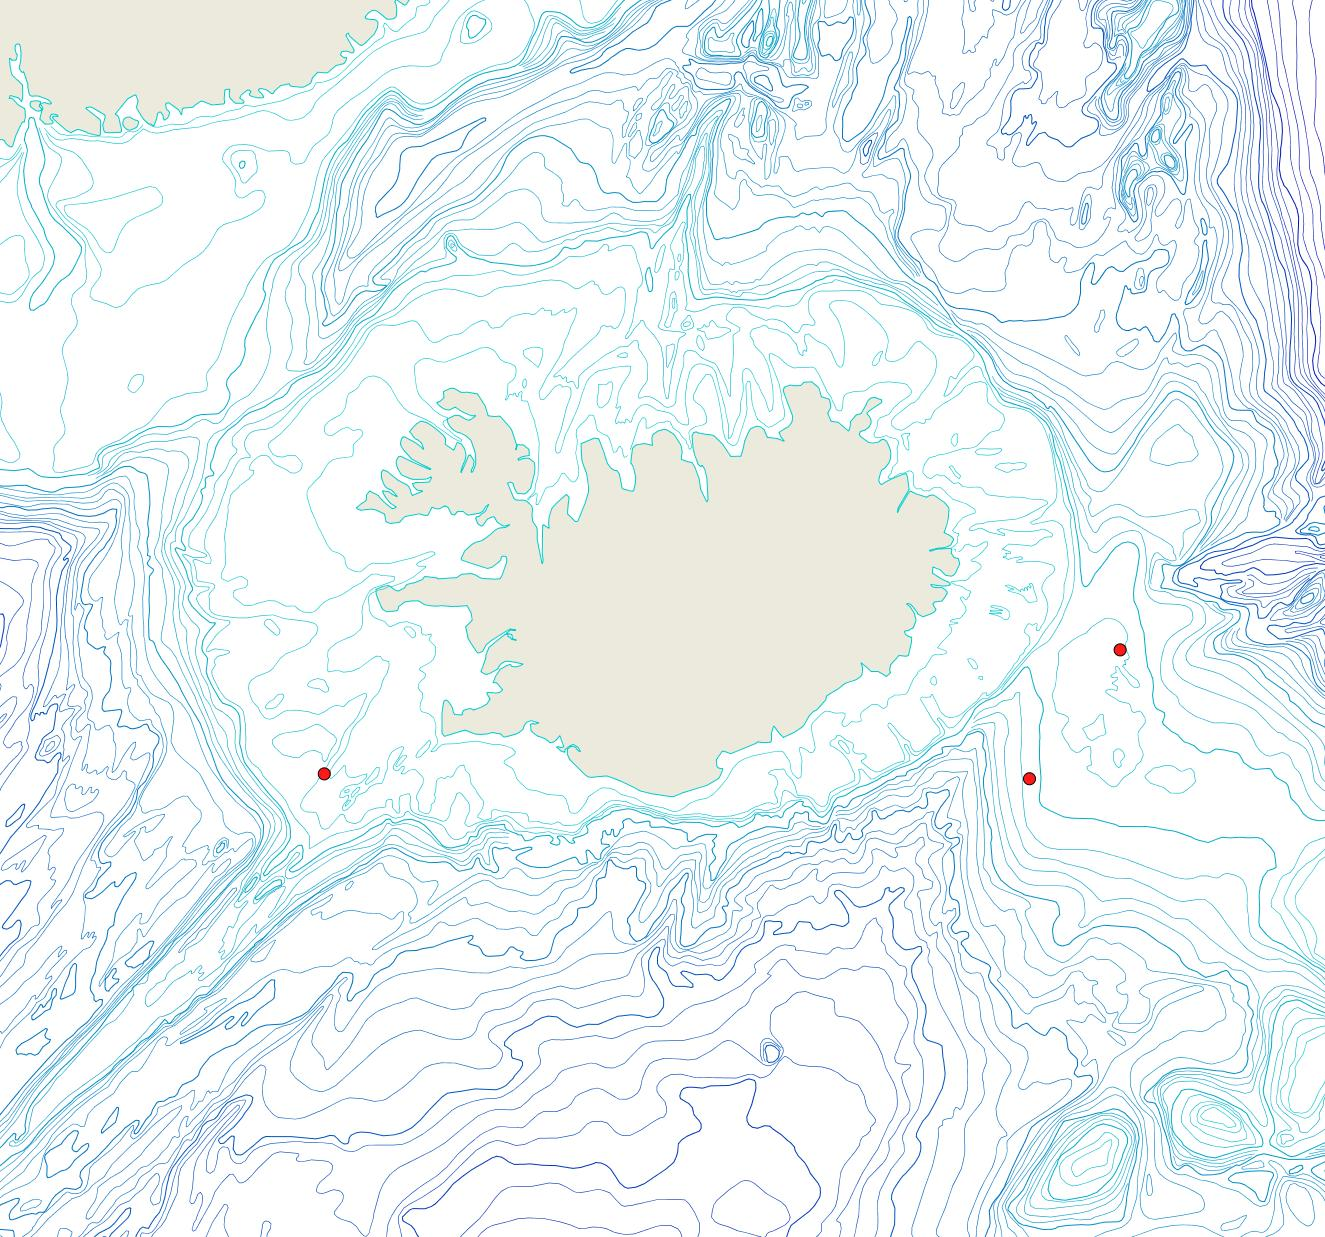 Útbreiðsla Leieschara subgracilis(Bioice samples, red dots)